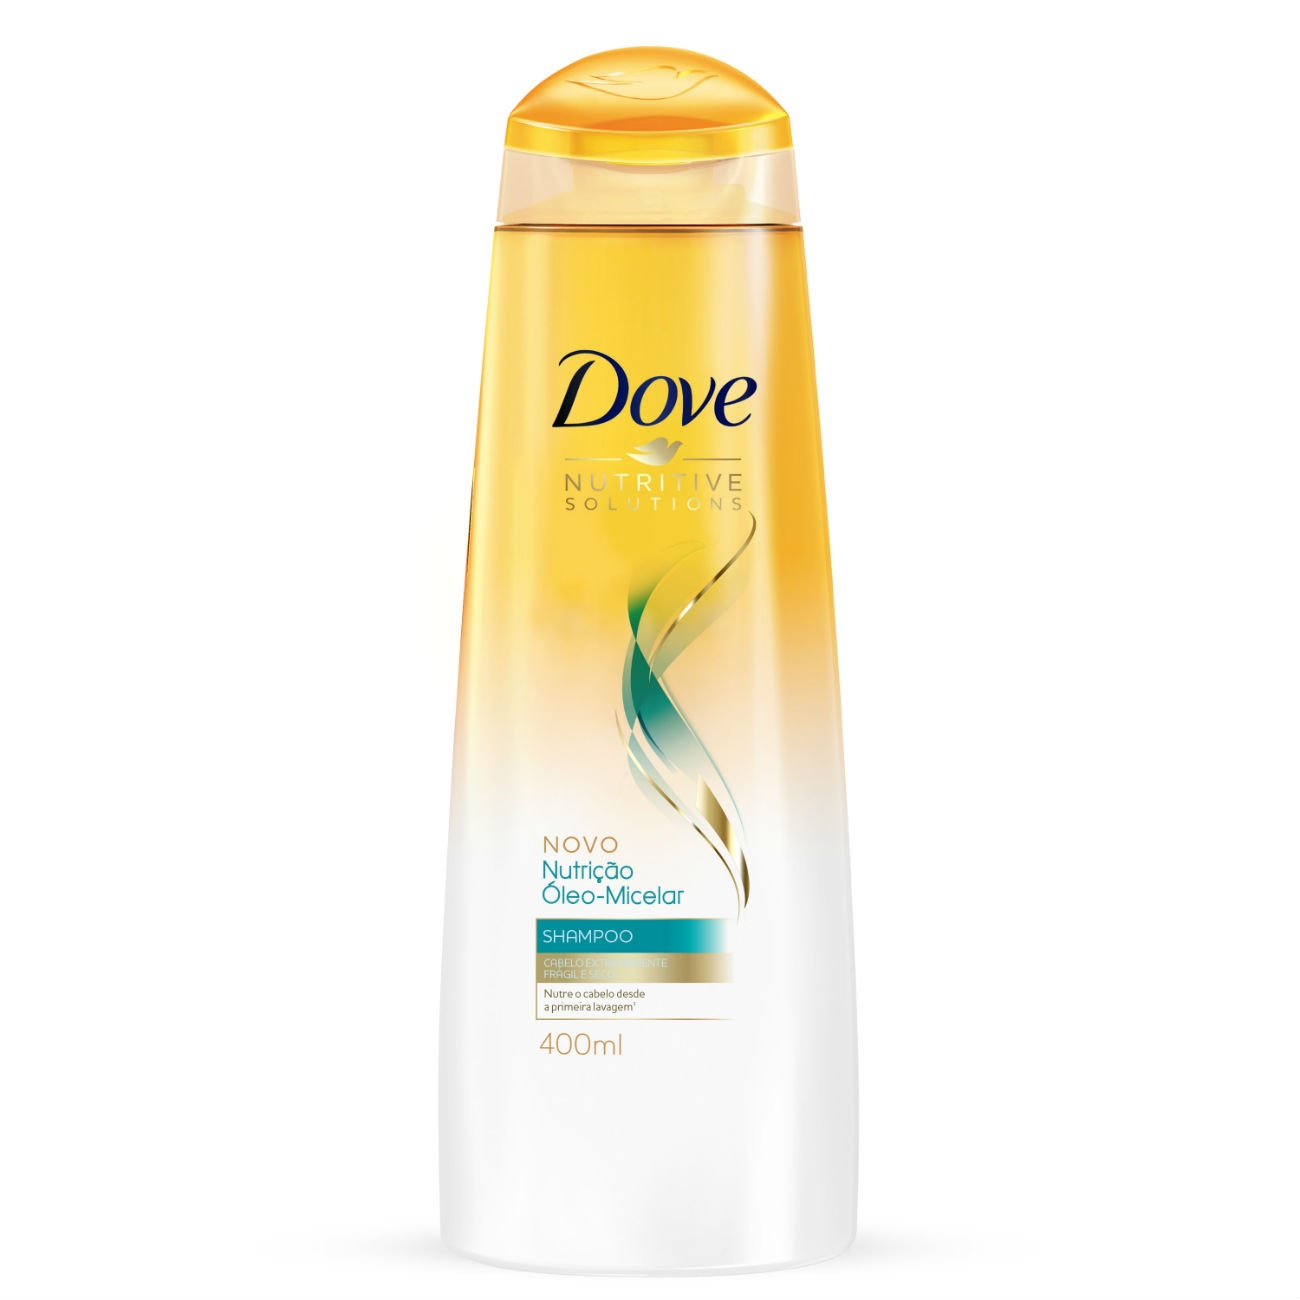 Shampoo Dove Nutri��o �leo-Micelar 400ml